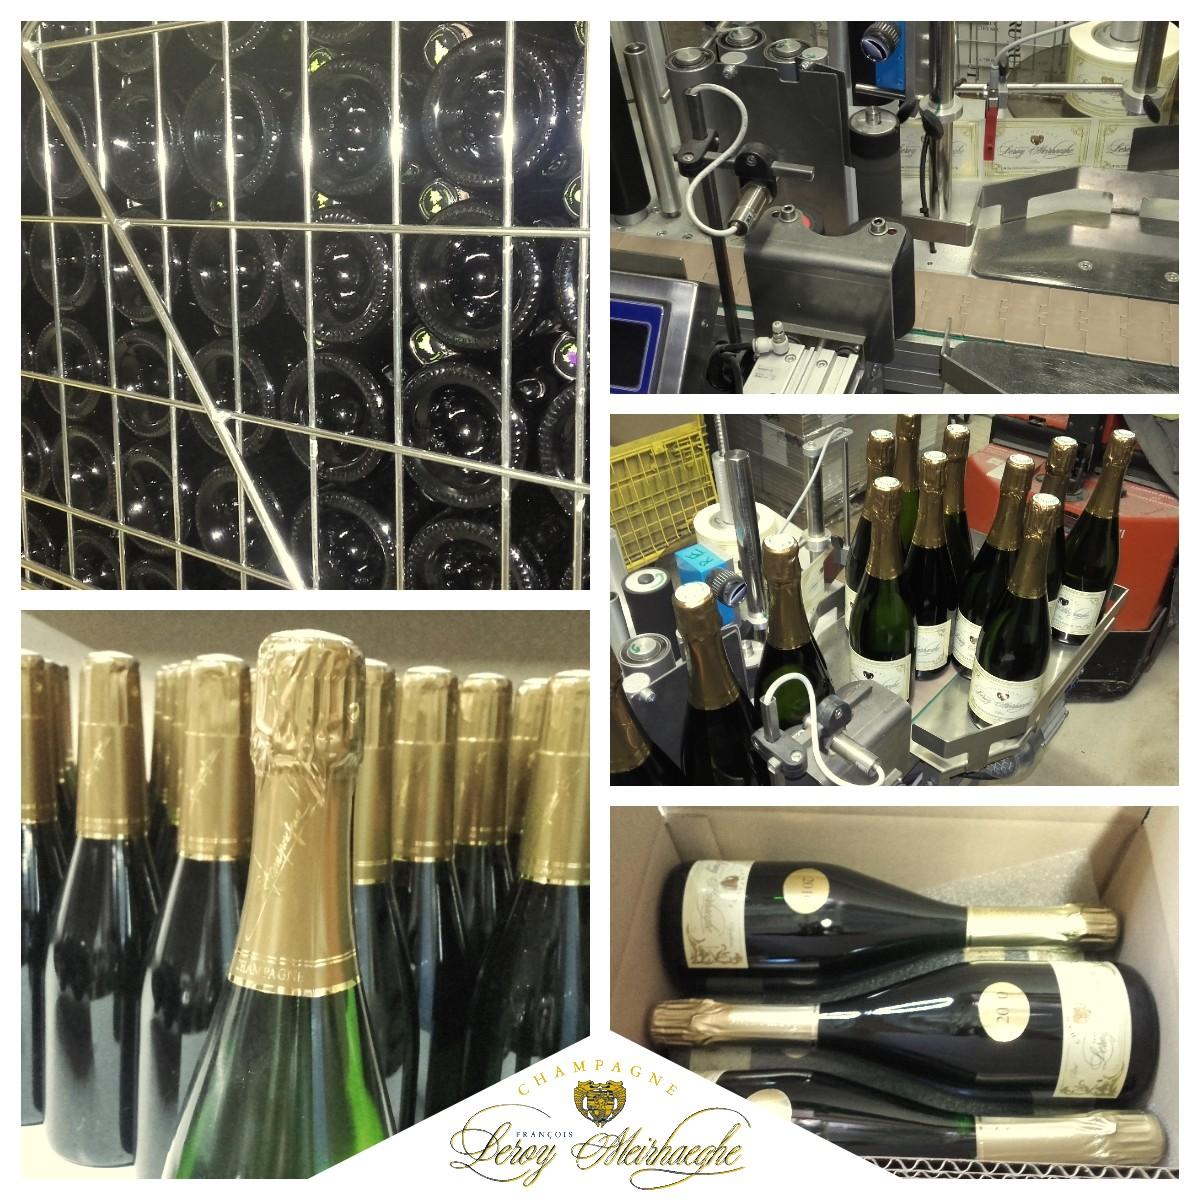 préparation-champagne-leroy-meirhaeghe